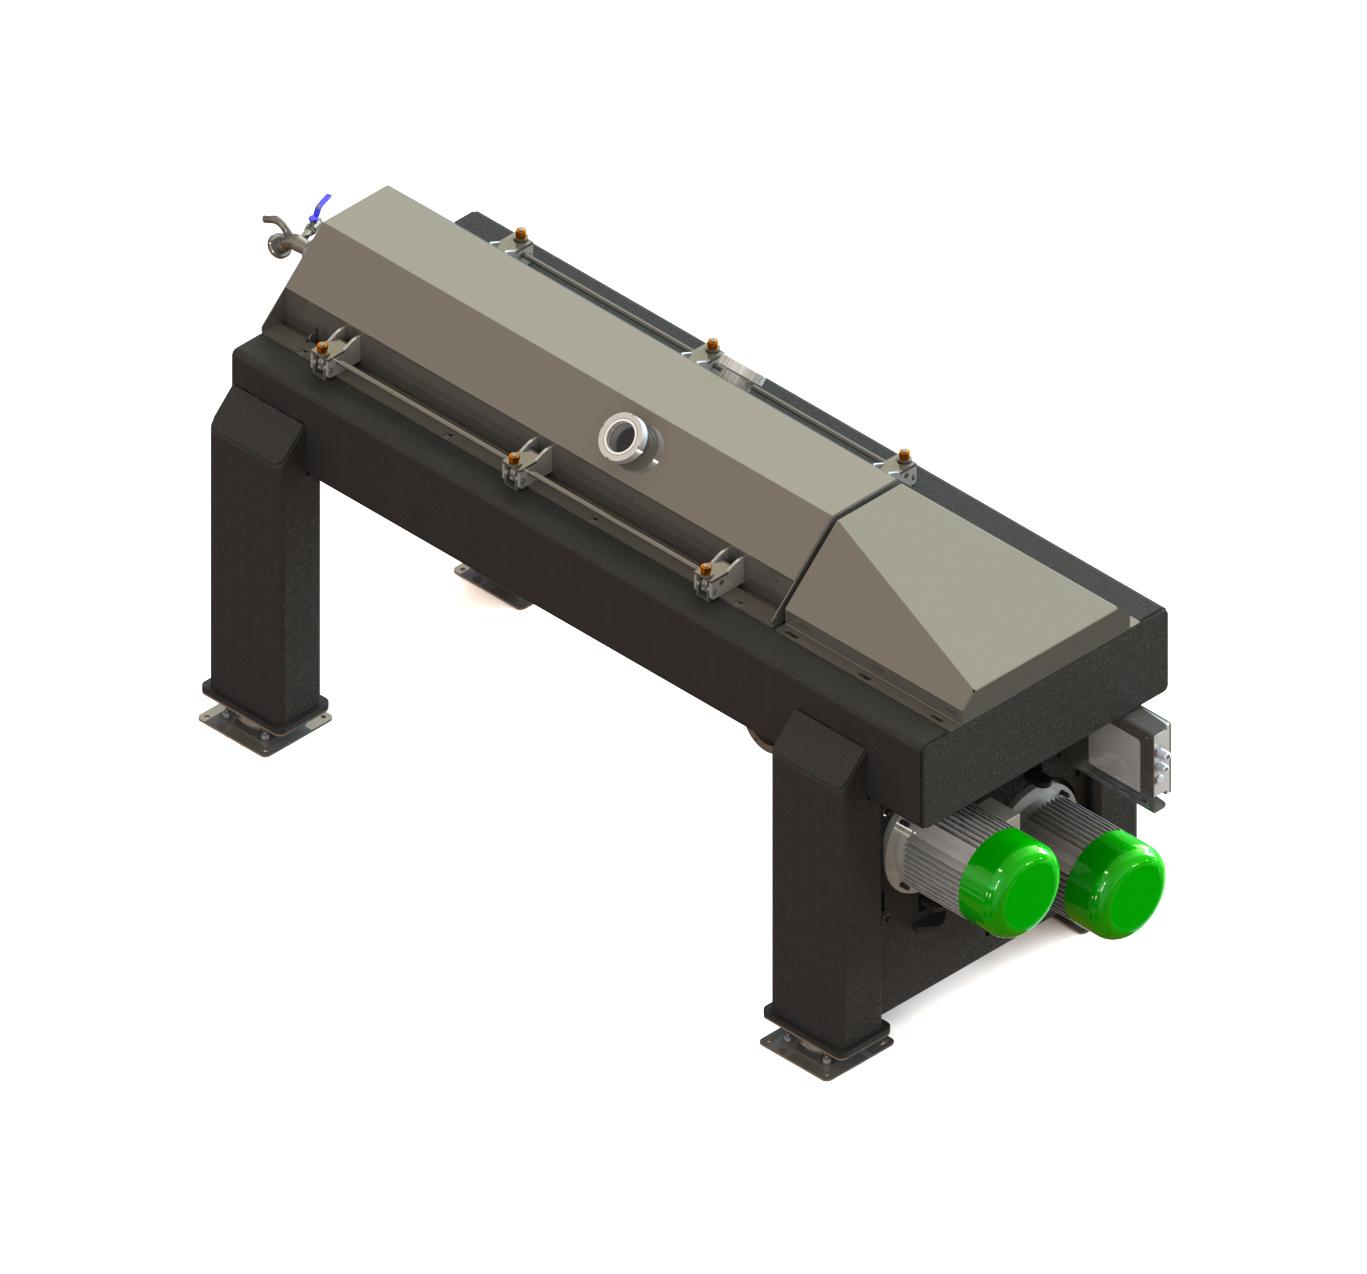 <strong>DECANTER DMX-1000</strong> Produzione oraria 1000-1200 Kg/h